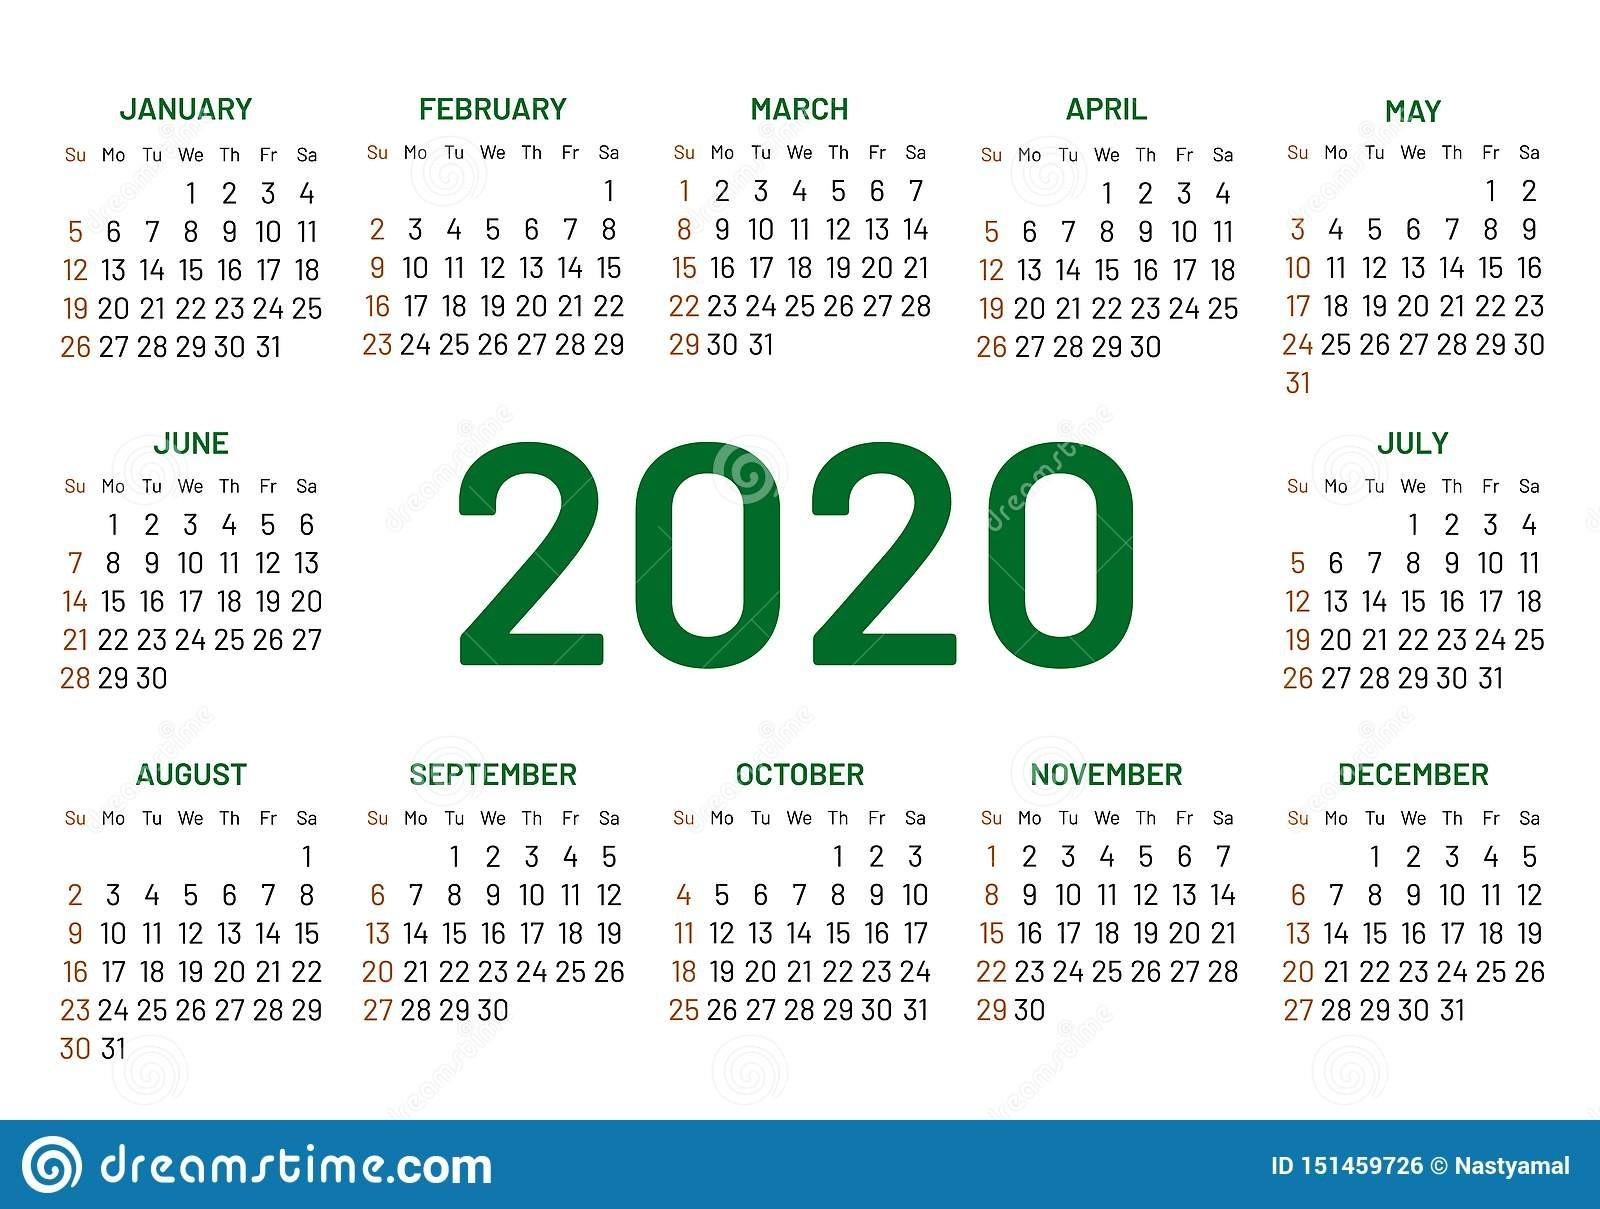 Pocket Calendar 2020 Year Stock Vector. Illustration Of Blue-2 Year Pocket Calendar Template